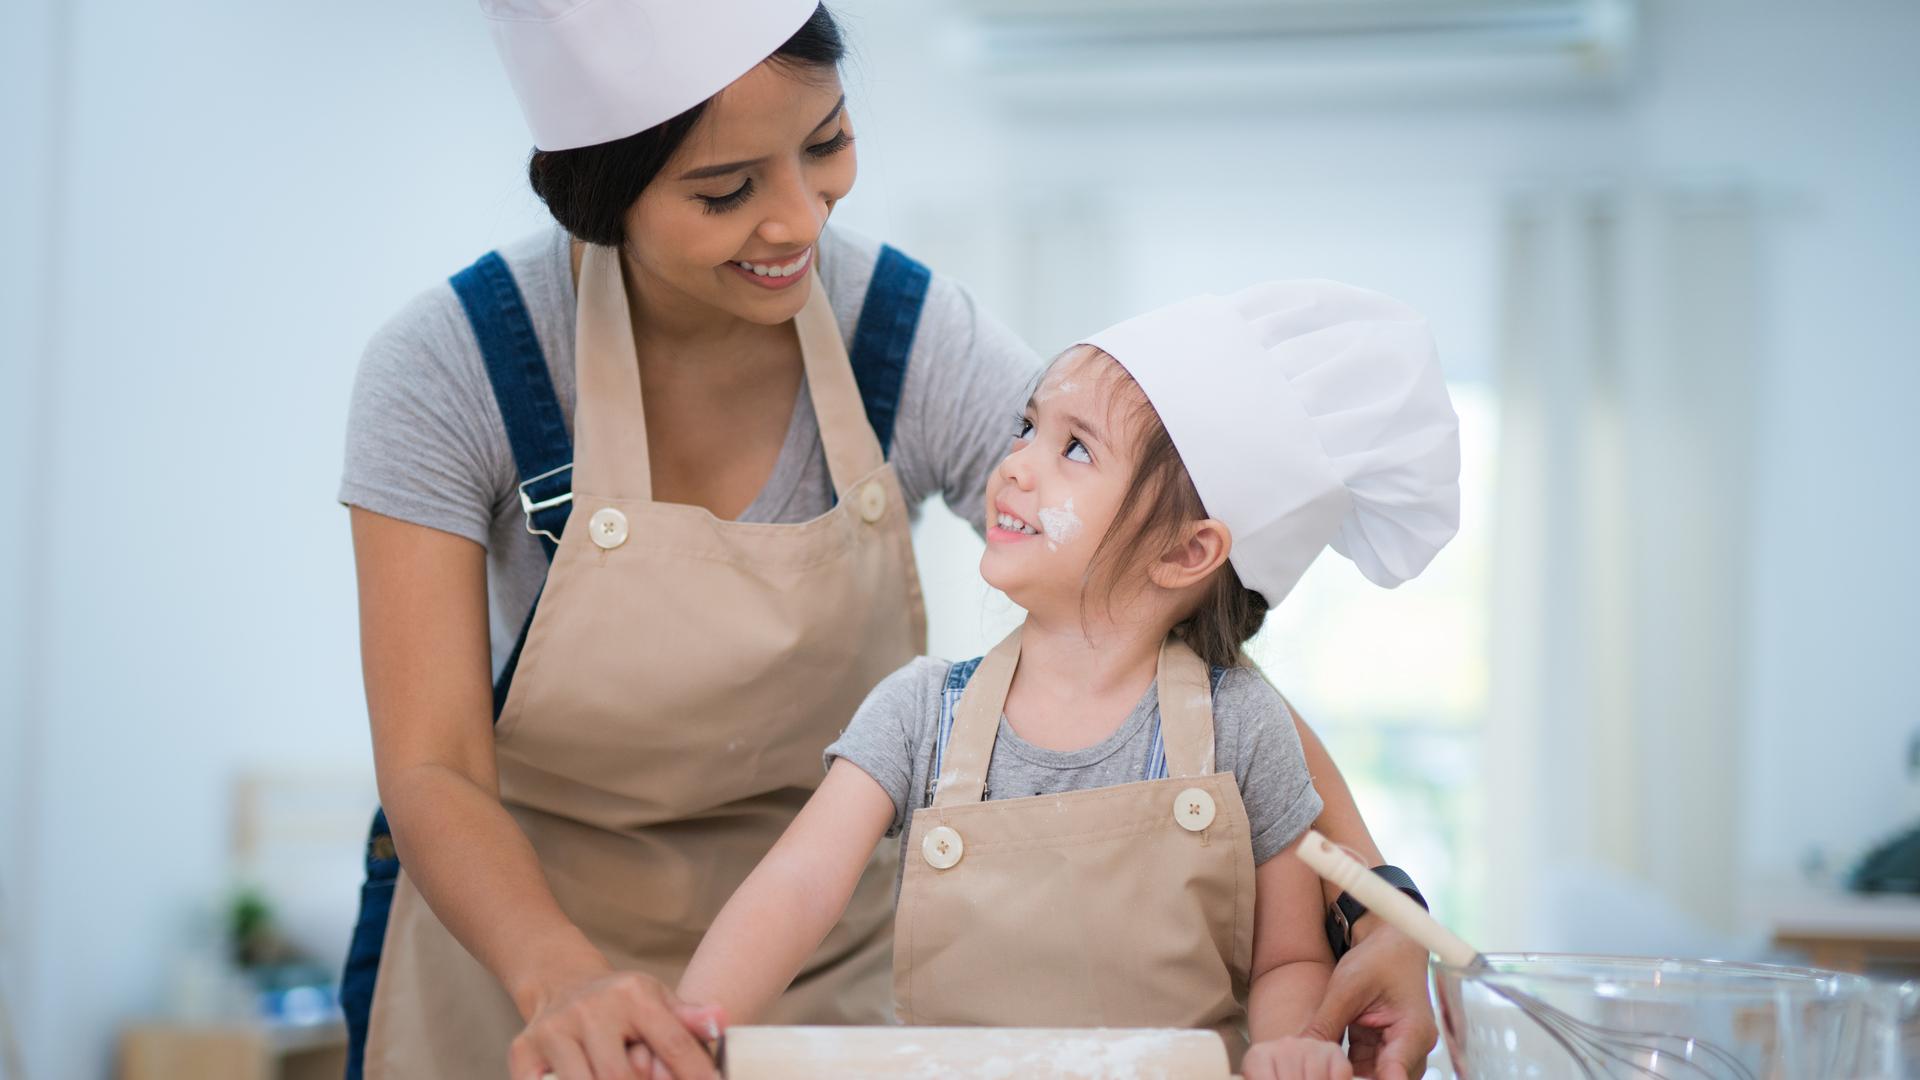 mama e hija amasando pan